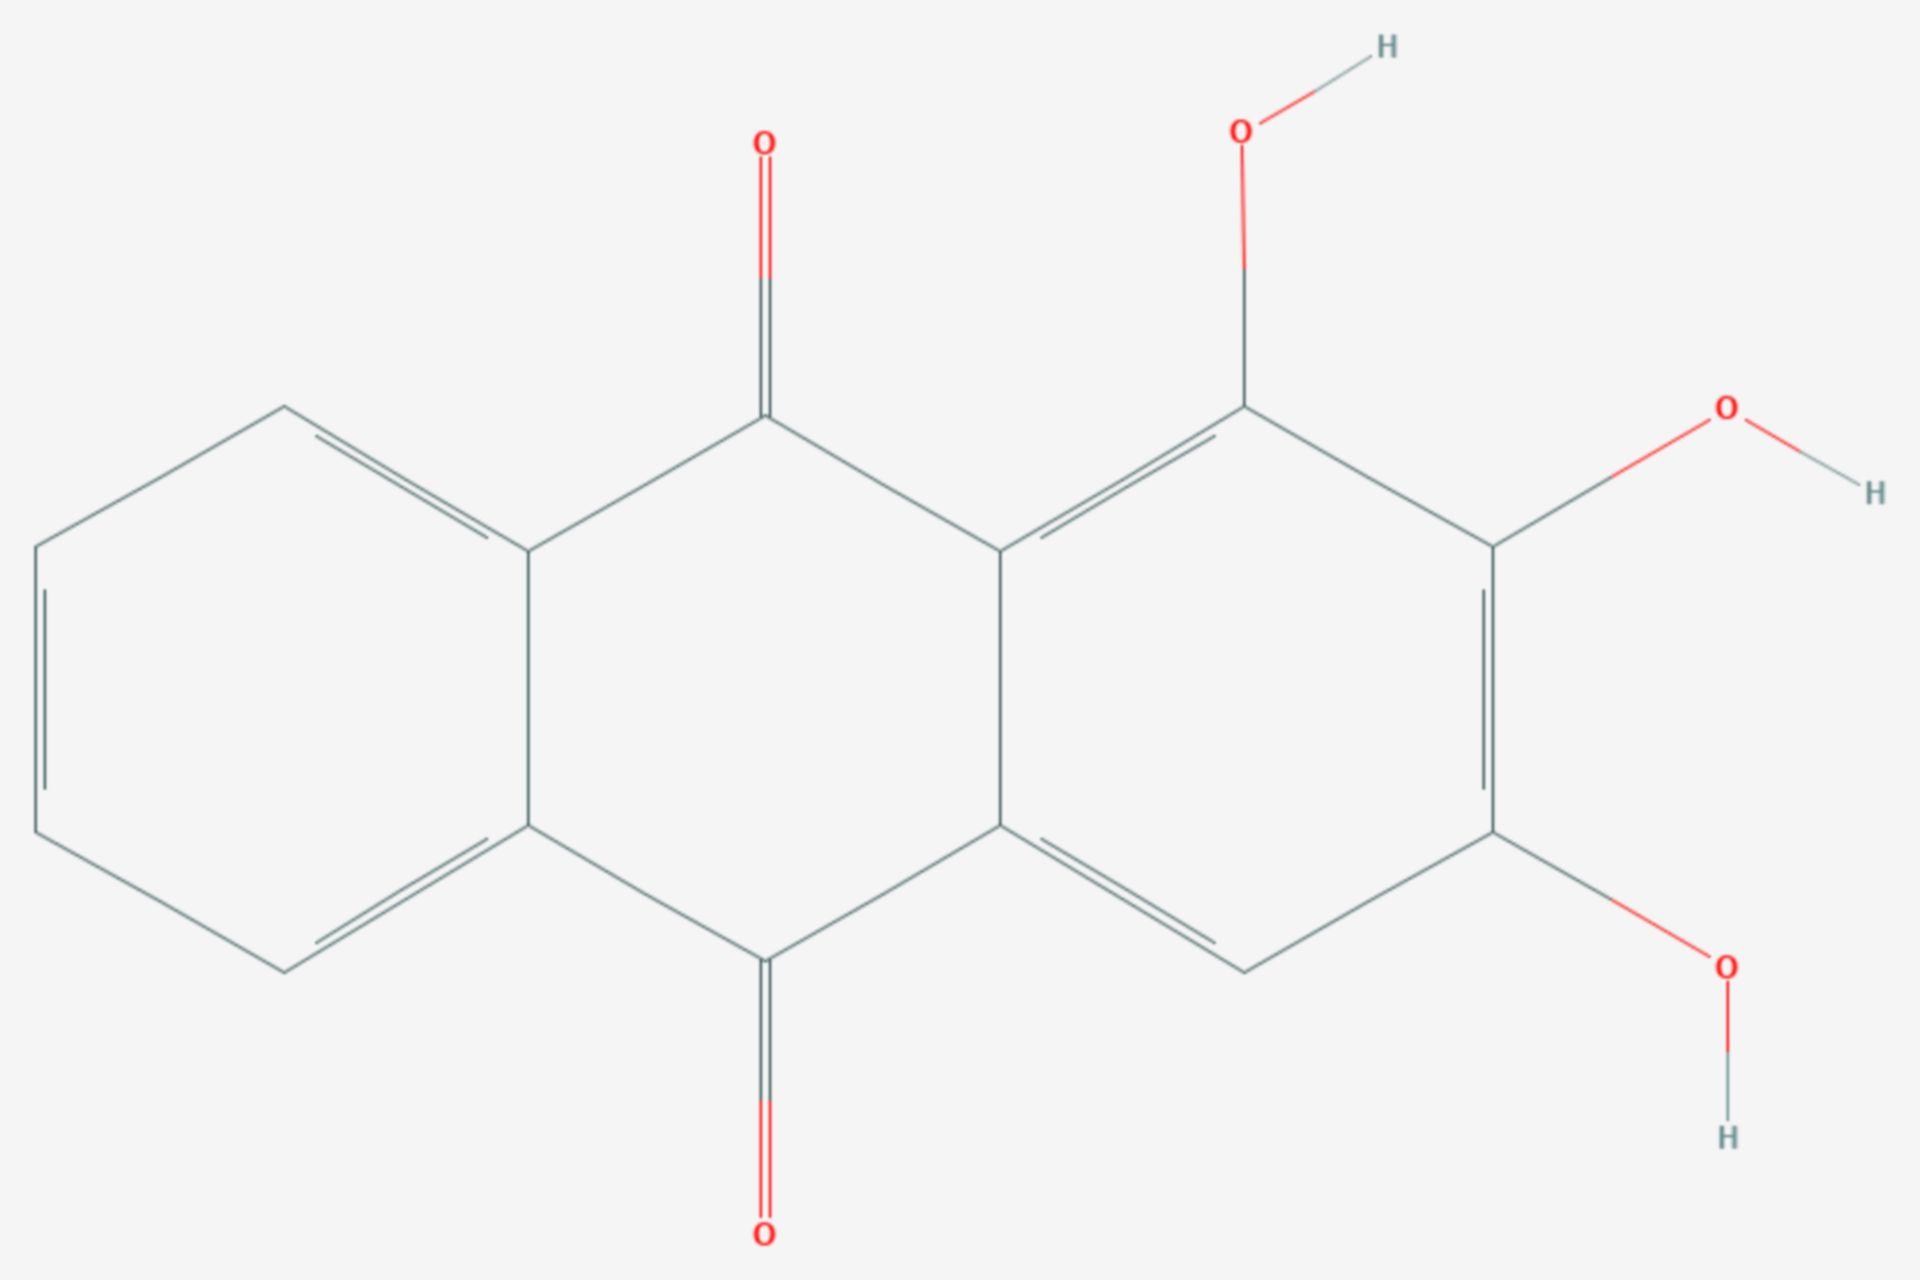 1,2,3-Trihydroxy-9,10-anthrachinon (Strukturformel)